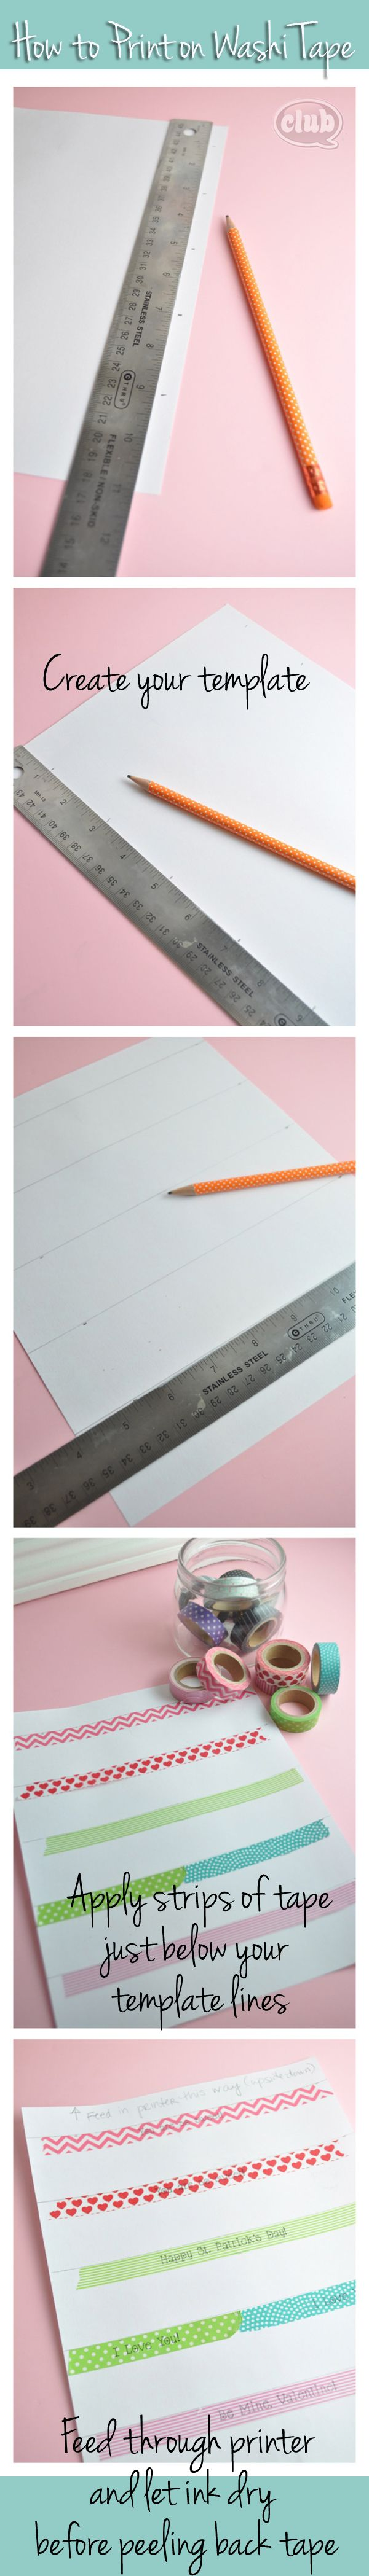 Print on Washi Tape via craft ideas @clubchicacircle